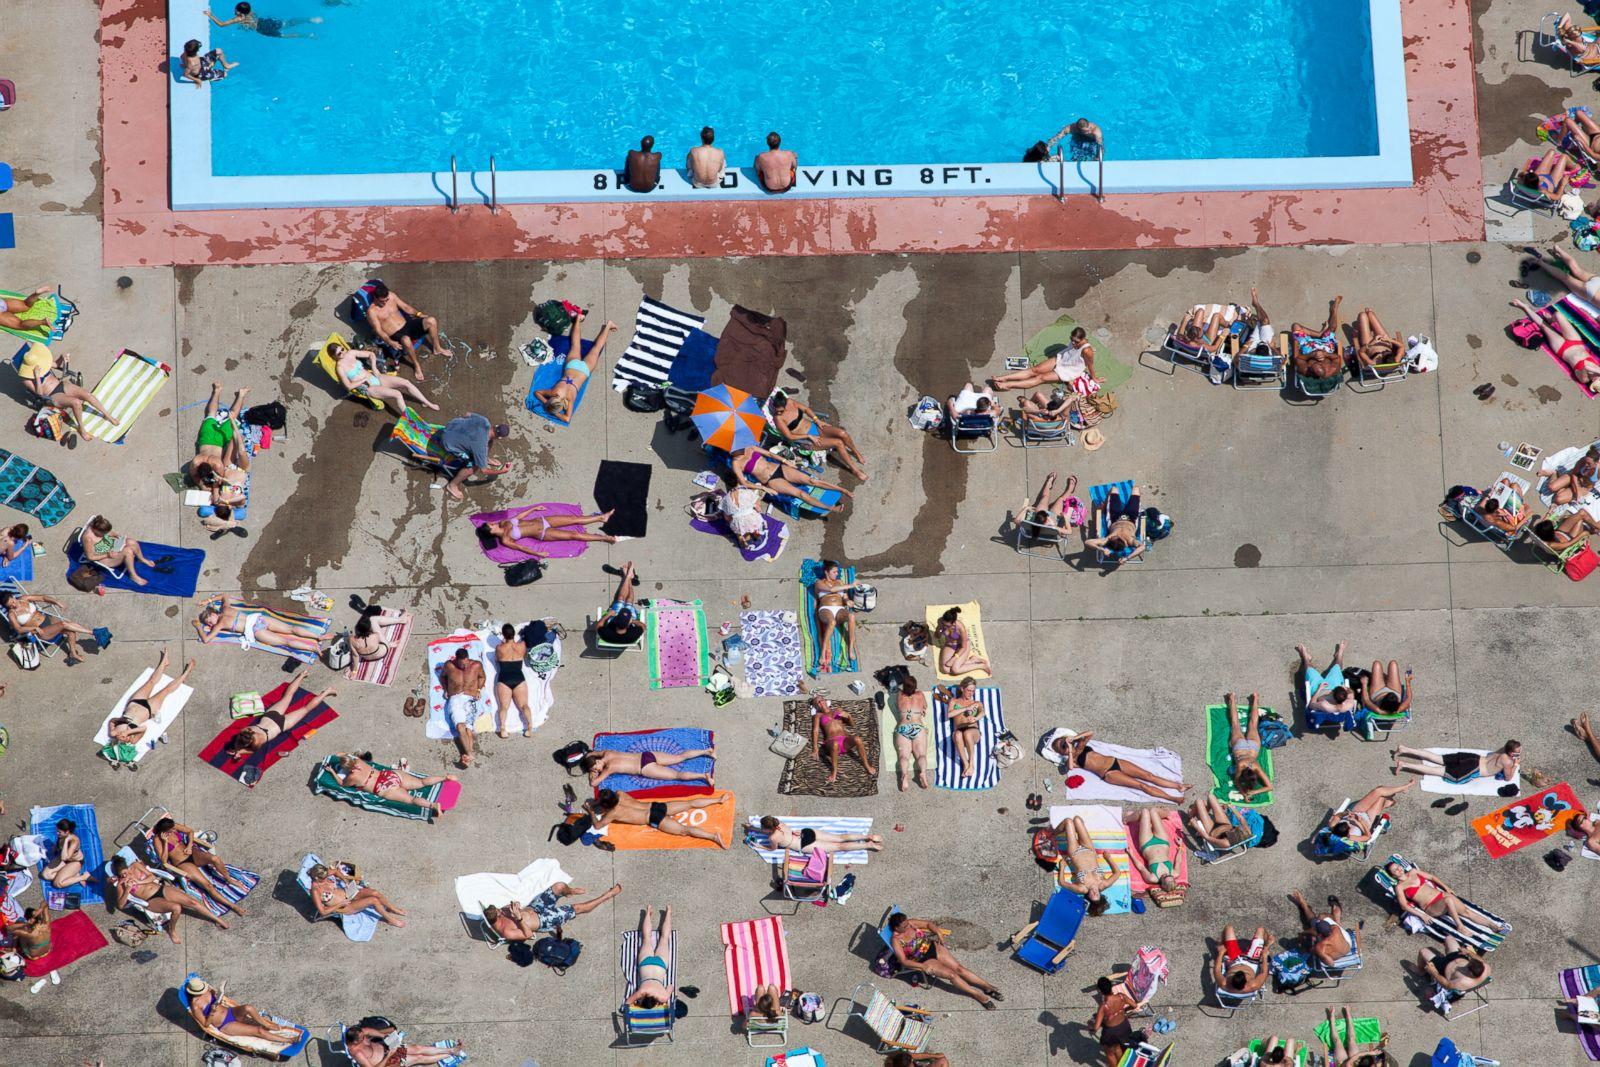 People tanning poolside in Cambridge, Massachusetts